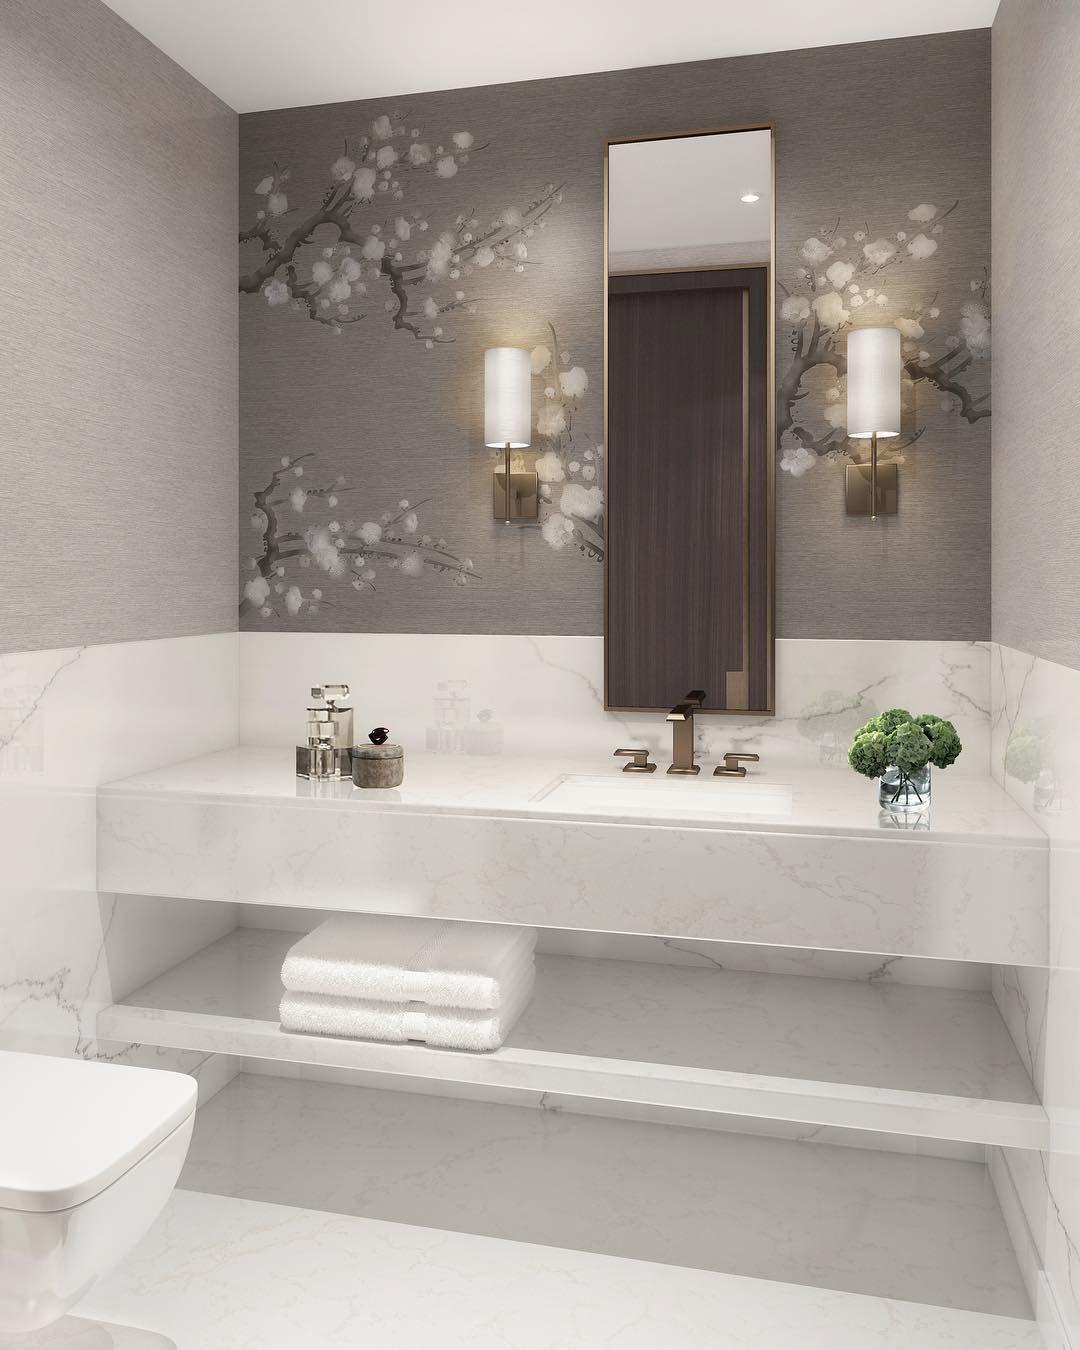 Guest loo goals bathroom pinterest goal